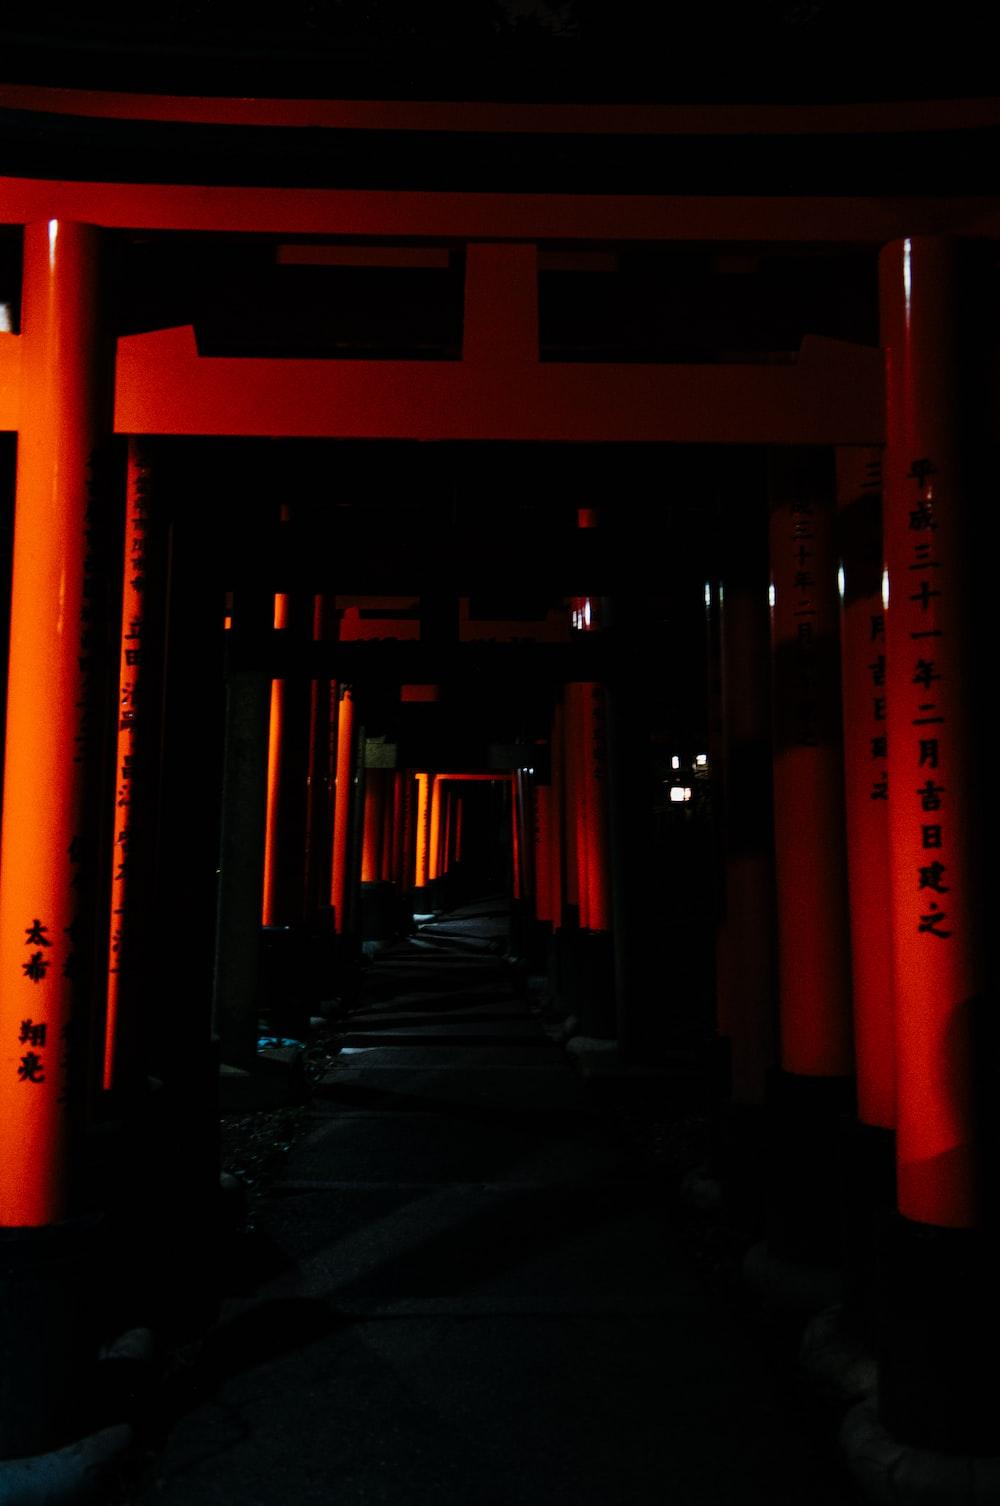 pathway between red gateways